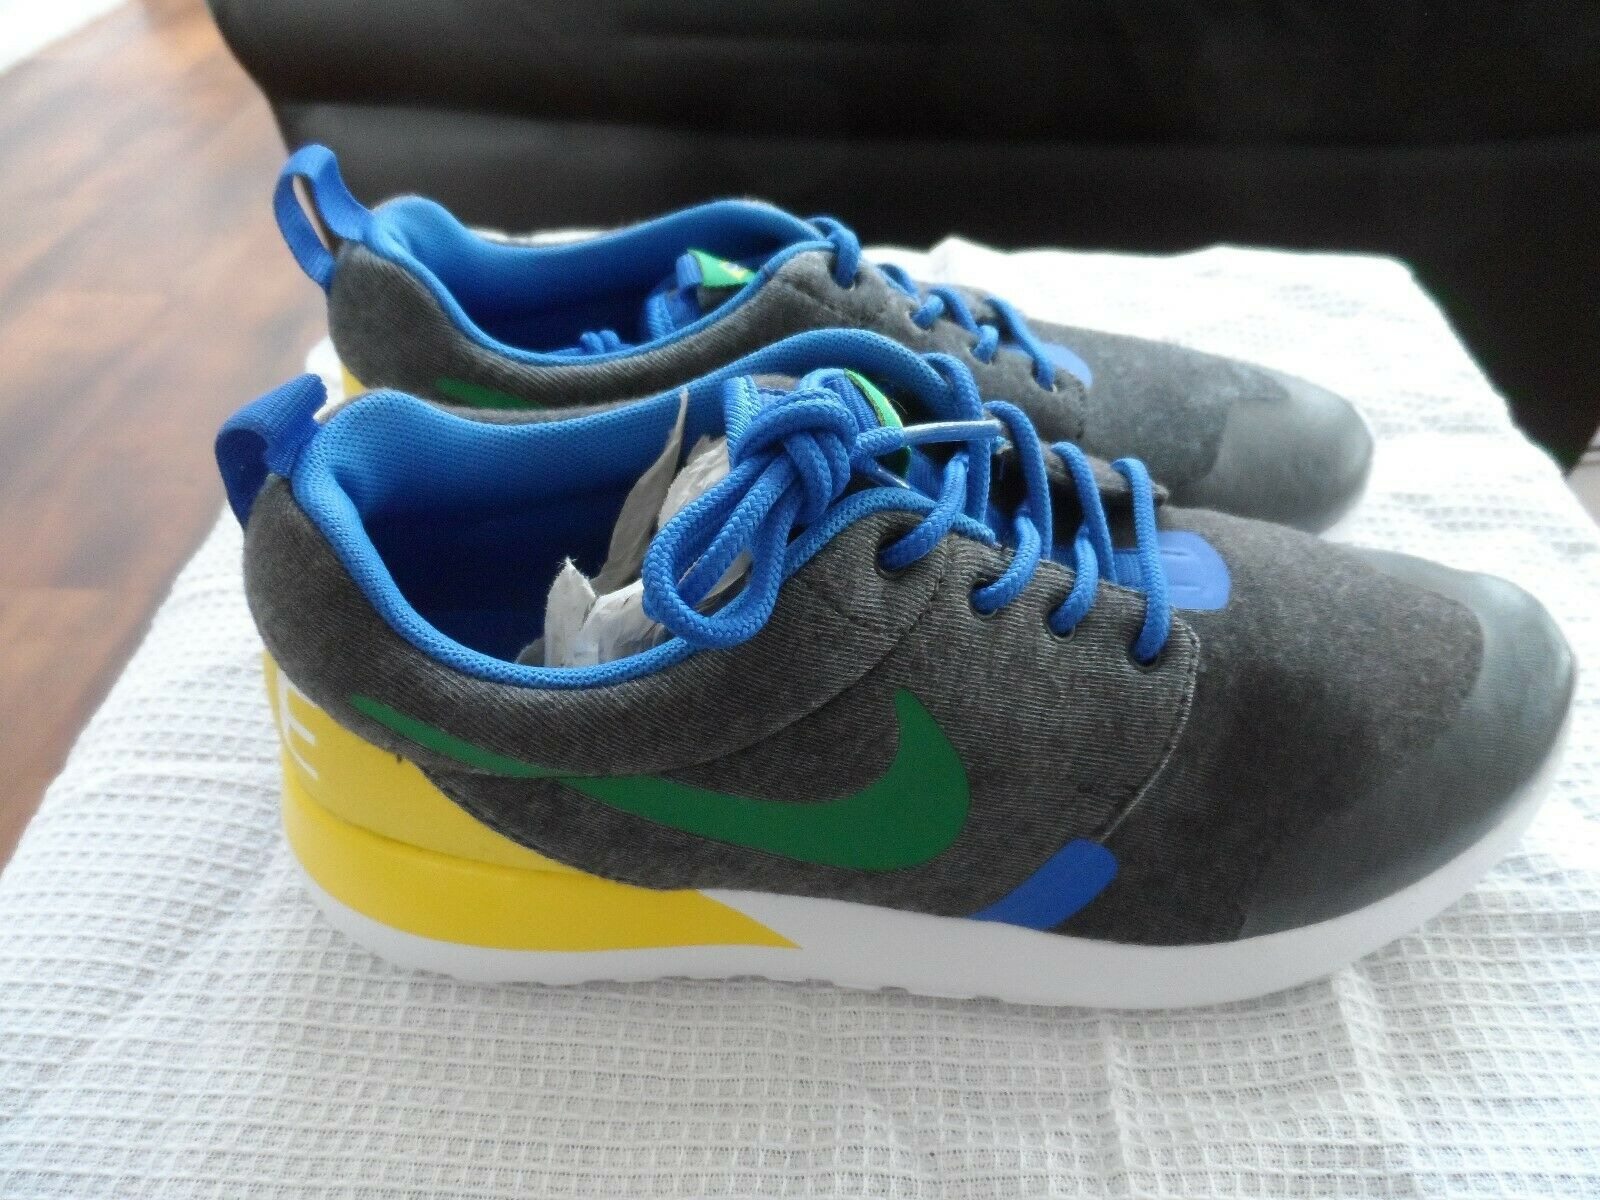 NUOVO Nike Rosherun Roshe Roshe Roshe BRASILE QS GS ONE WORLD CUP 2 TECH F Taglia EU 37.5 95bdee